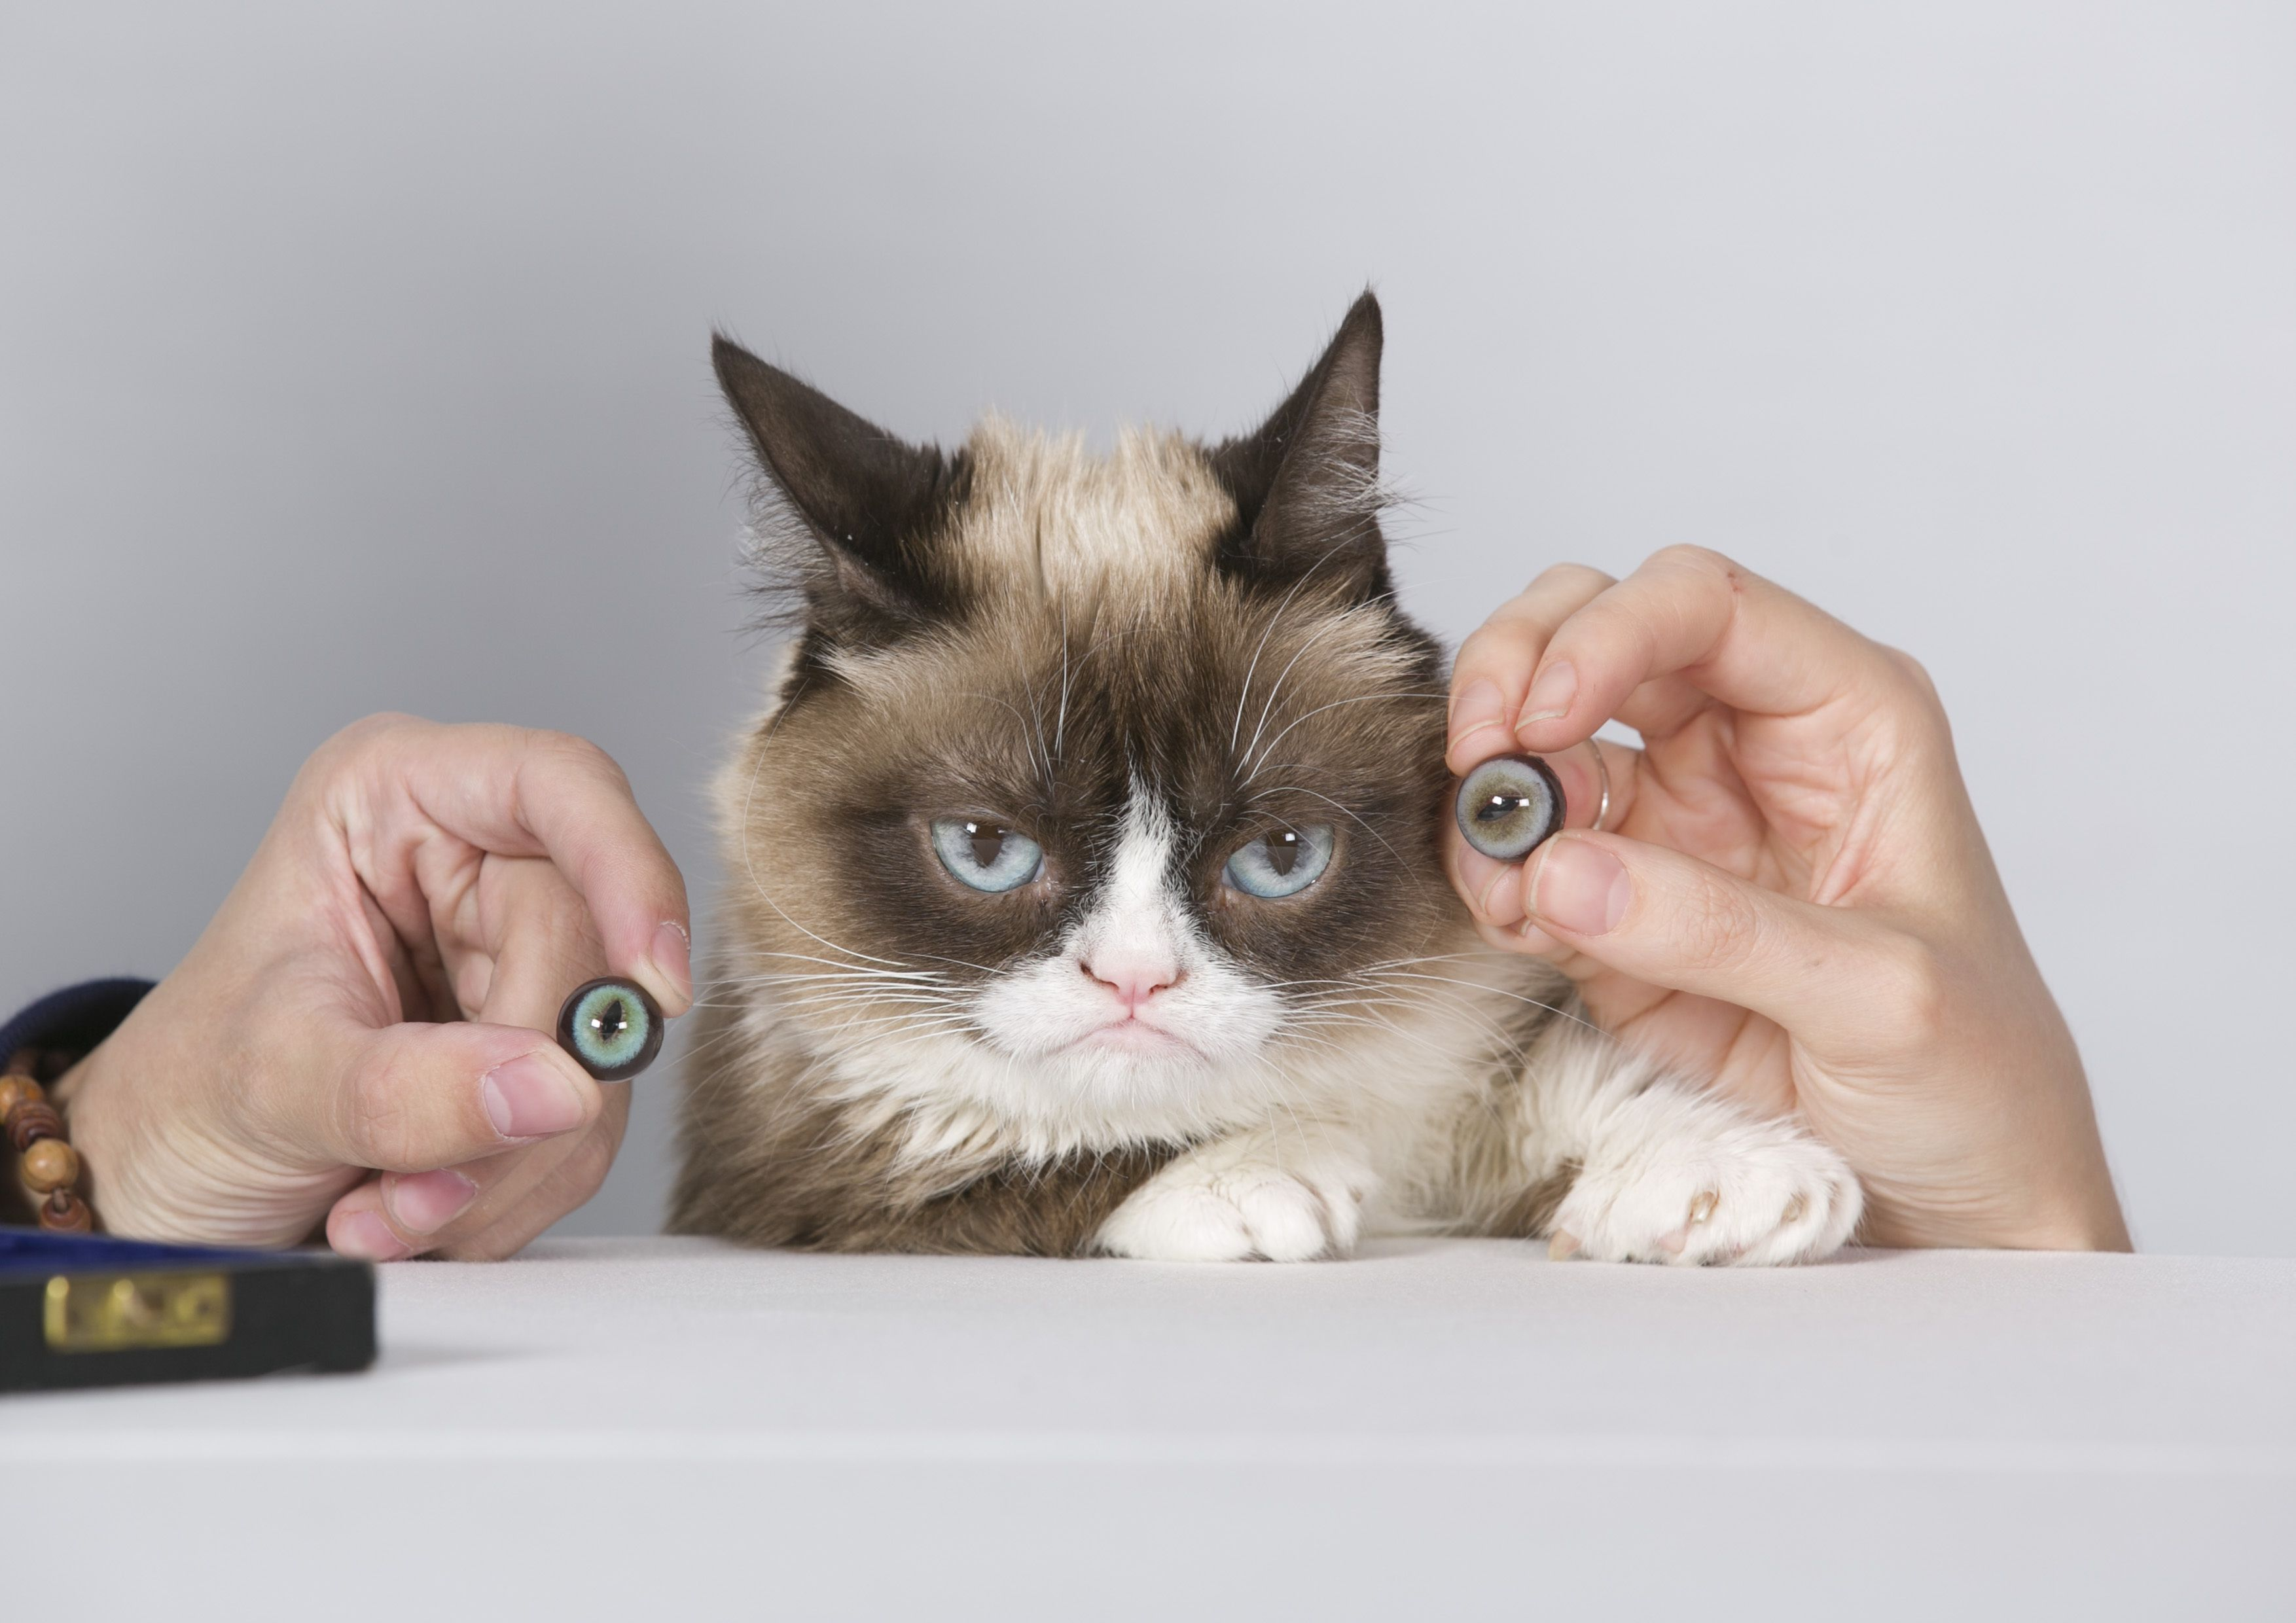 Pin On Grumpy Cat And More Grumpy Cat